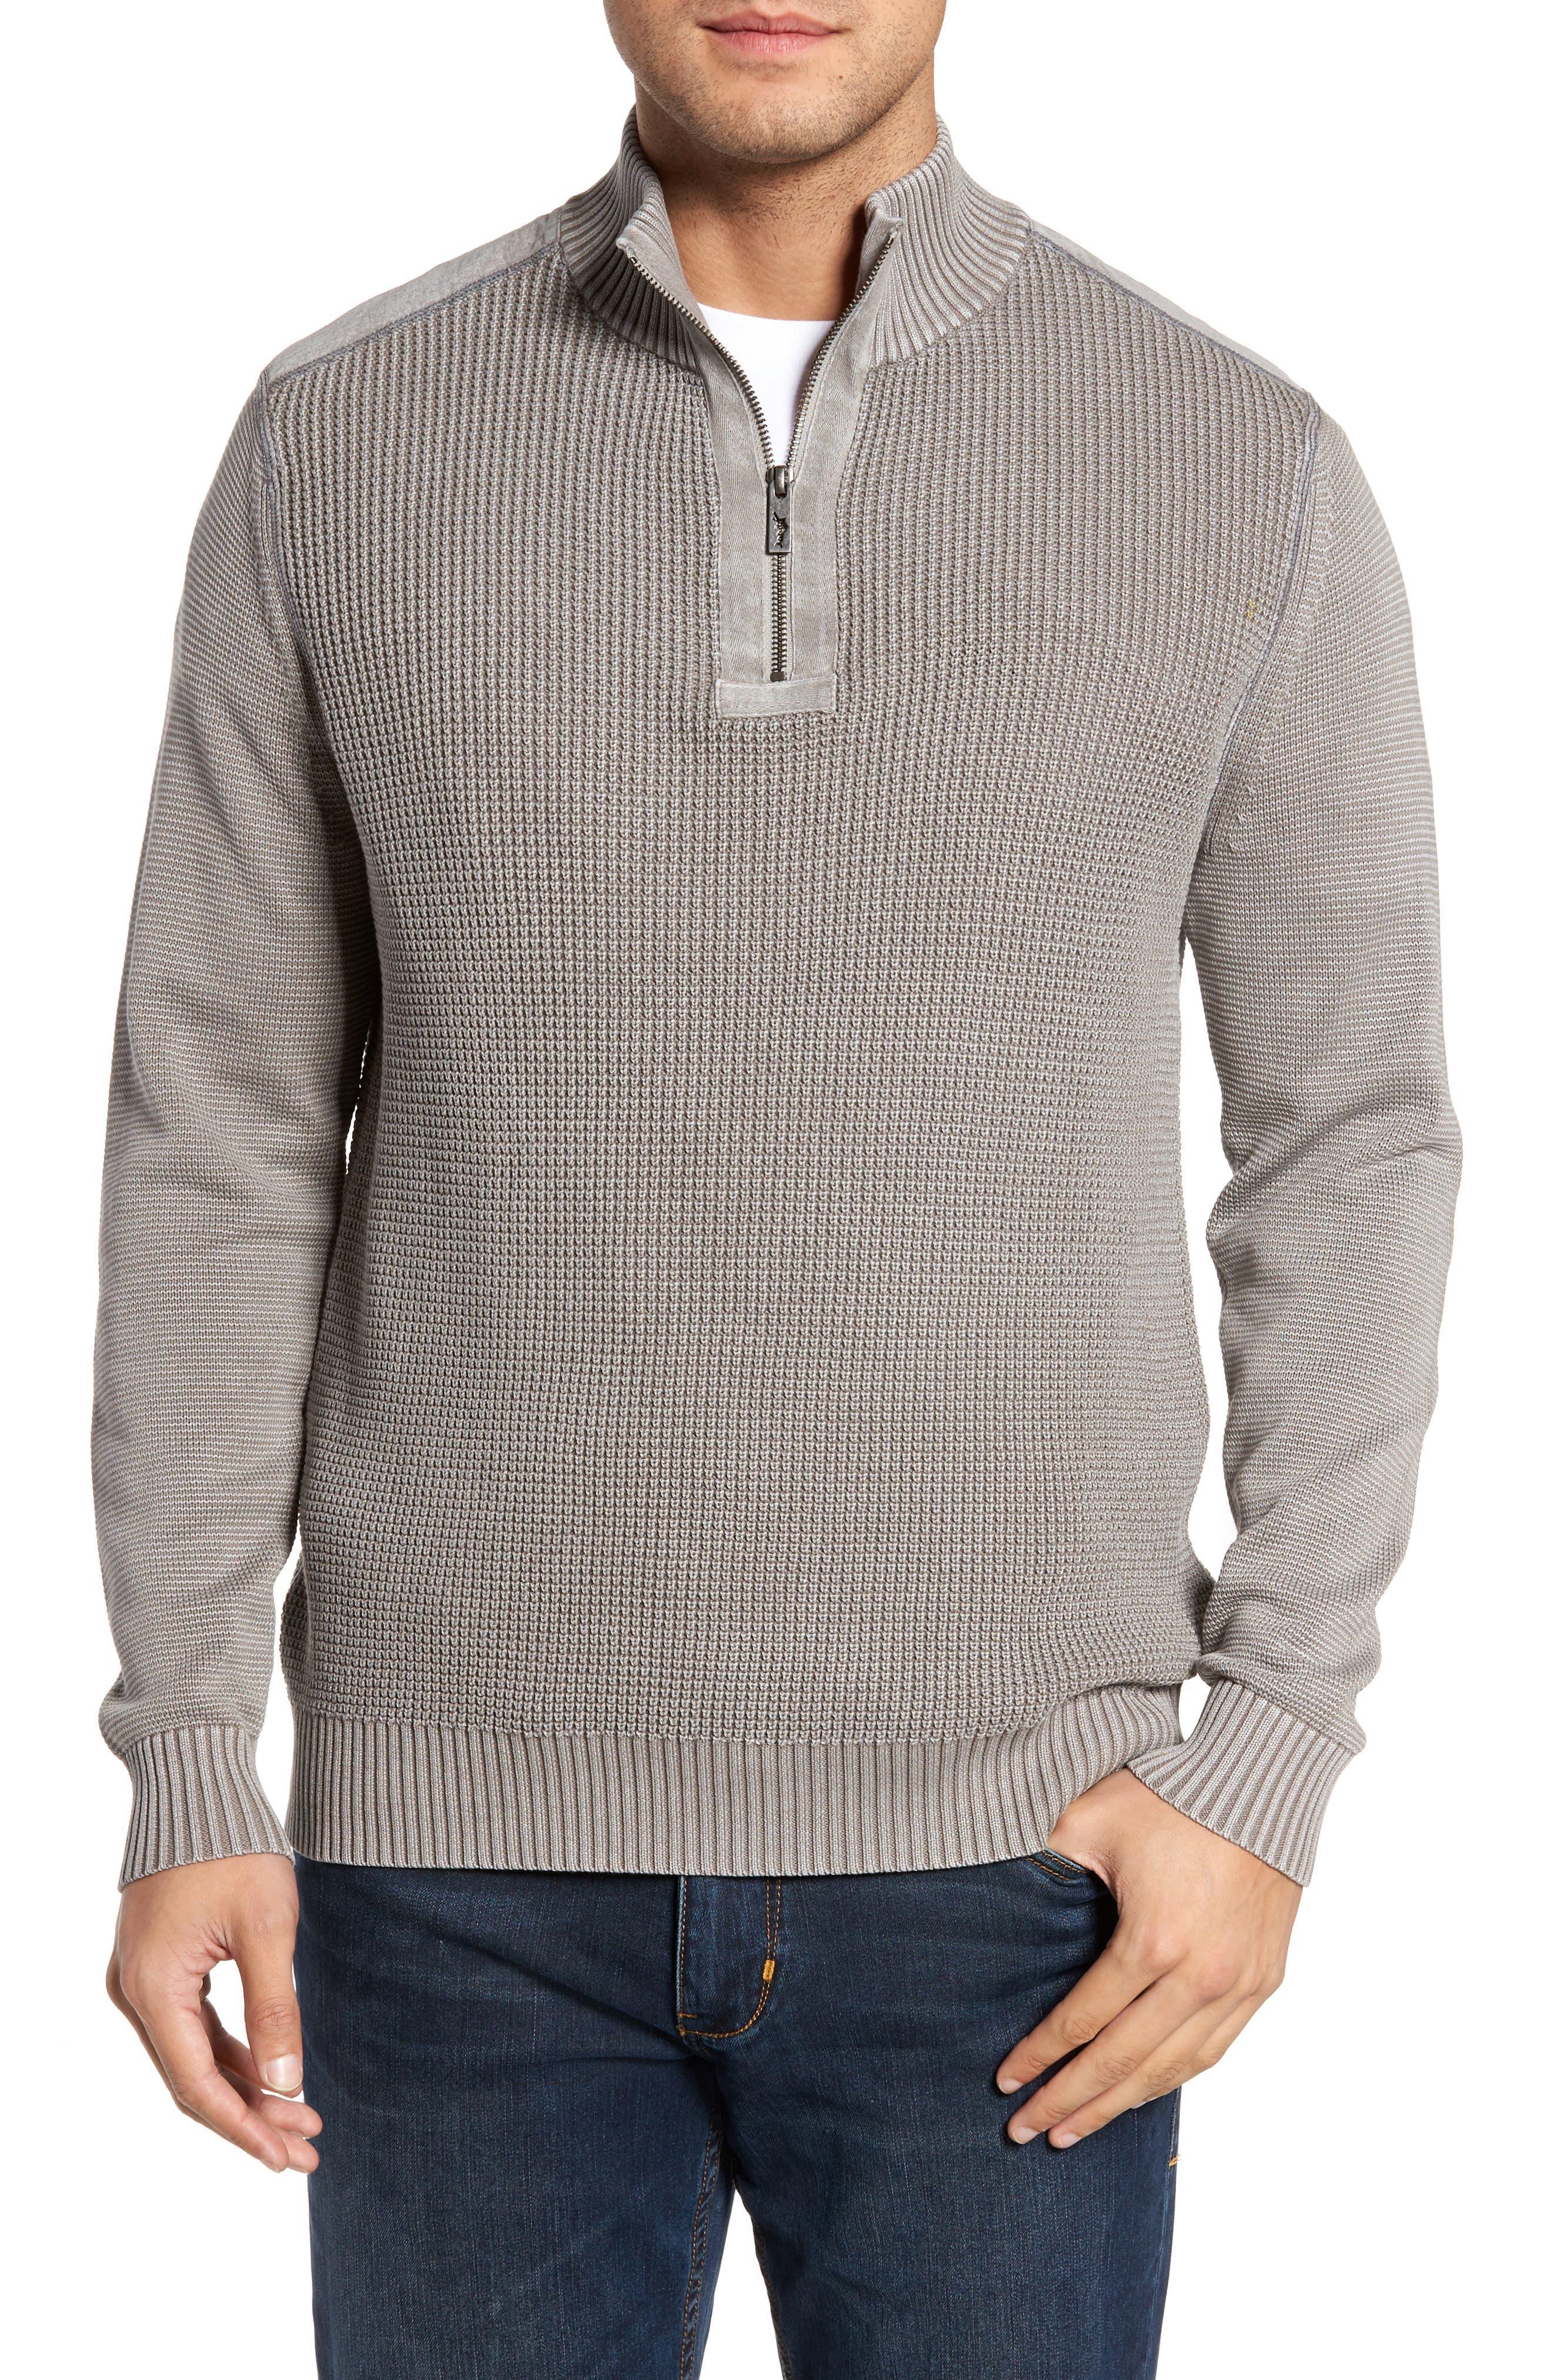 Tommy Bahama 'Coastal Shores' Quarter Zip Sweater